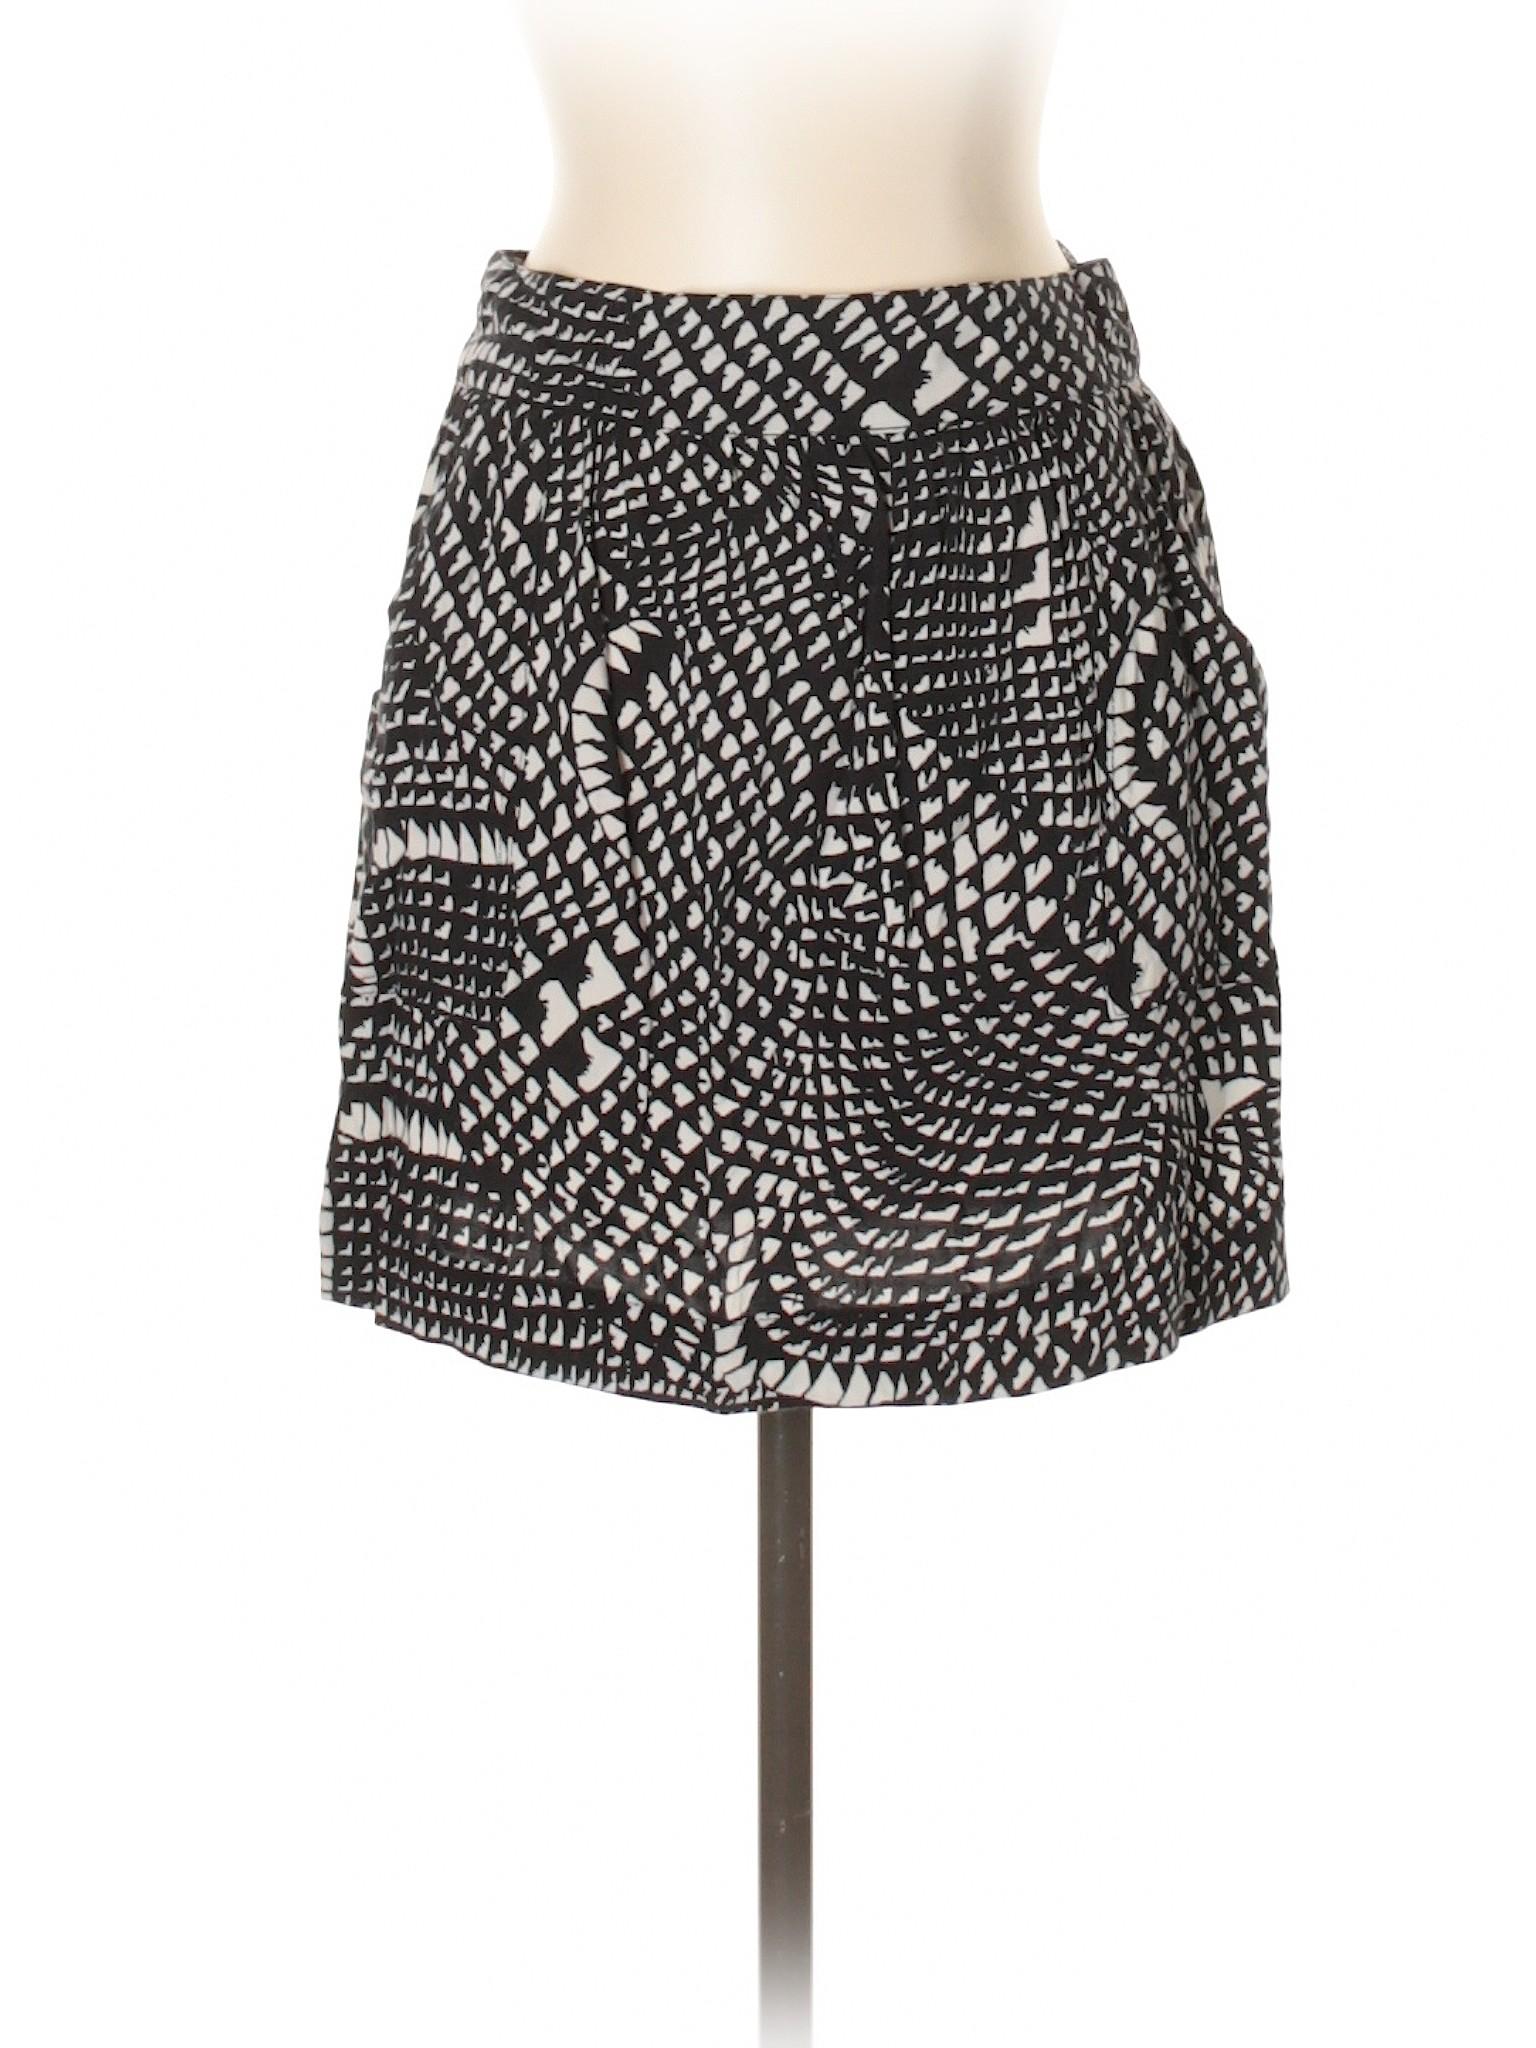 Casual Boutique Skirt XXI Boutique Skirt XXI Boutique Casual Boutique XXI XXI Skirt Casual P1qnA